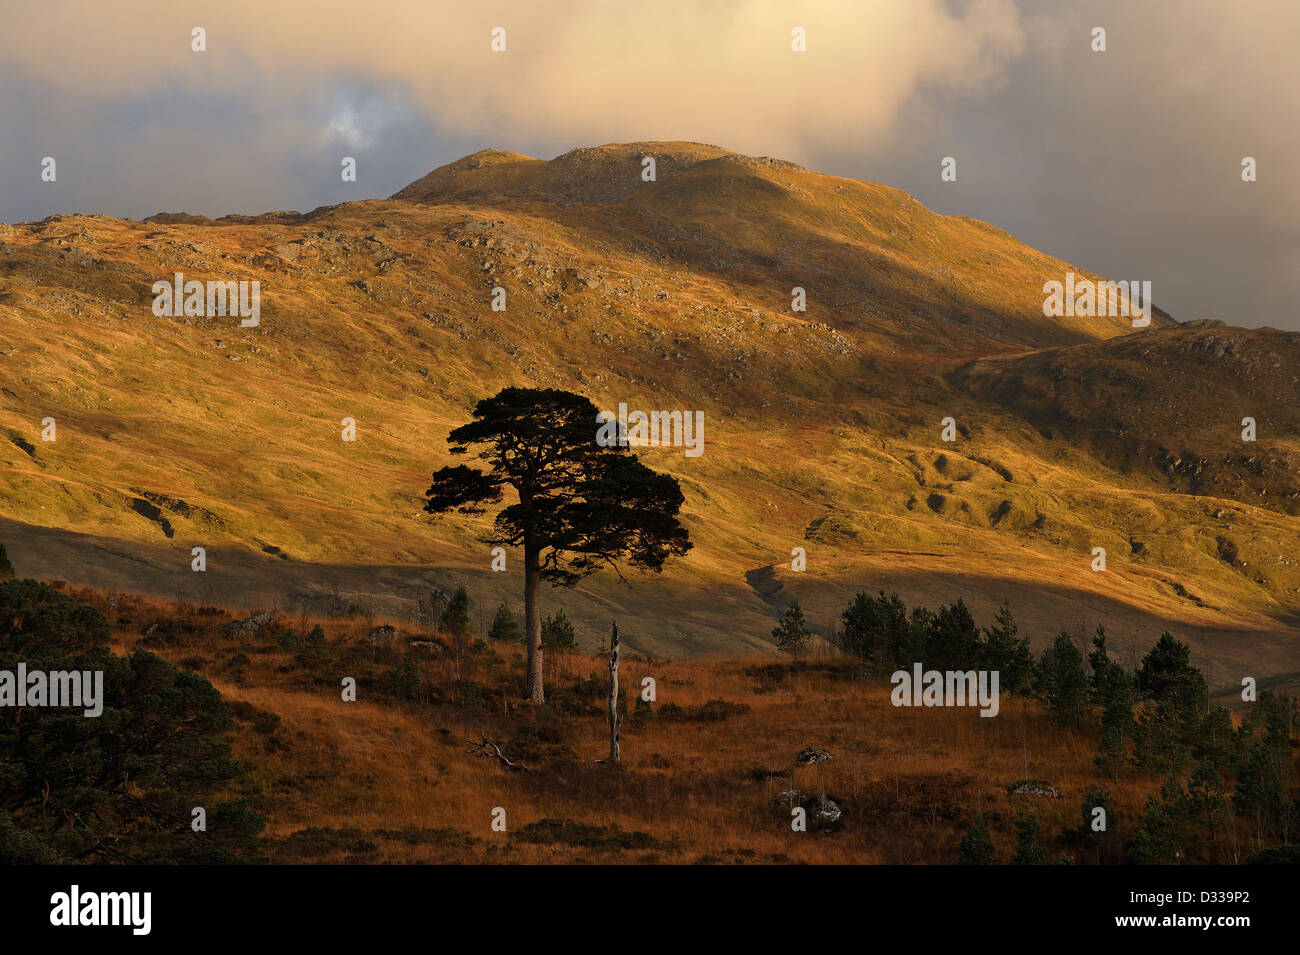 Pine trees silhouetted beneath hills of the Ben More Crianlarich range, Scottish Highlands Stock Photo